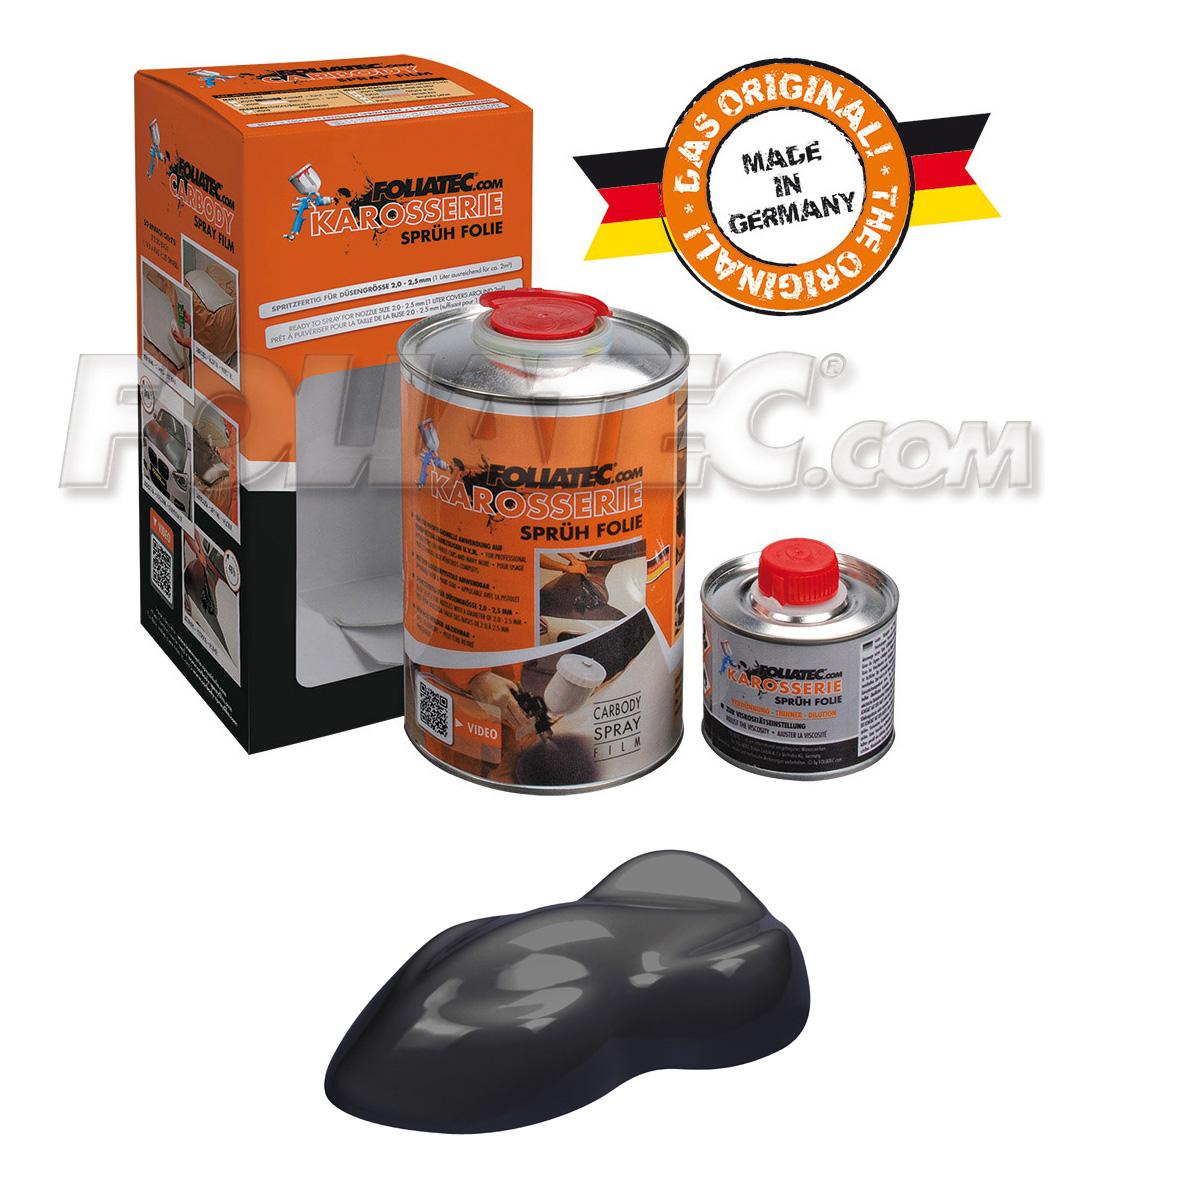 Foliatec Karosseriesprühfolie/Karosserie-Sprühfolie schwarz/black matt